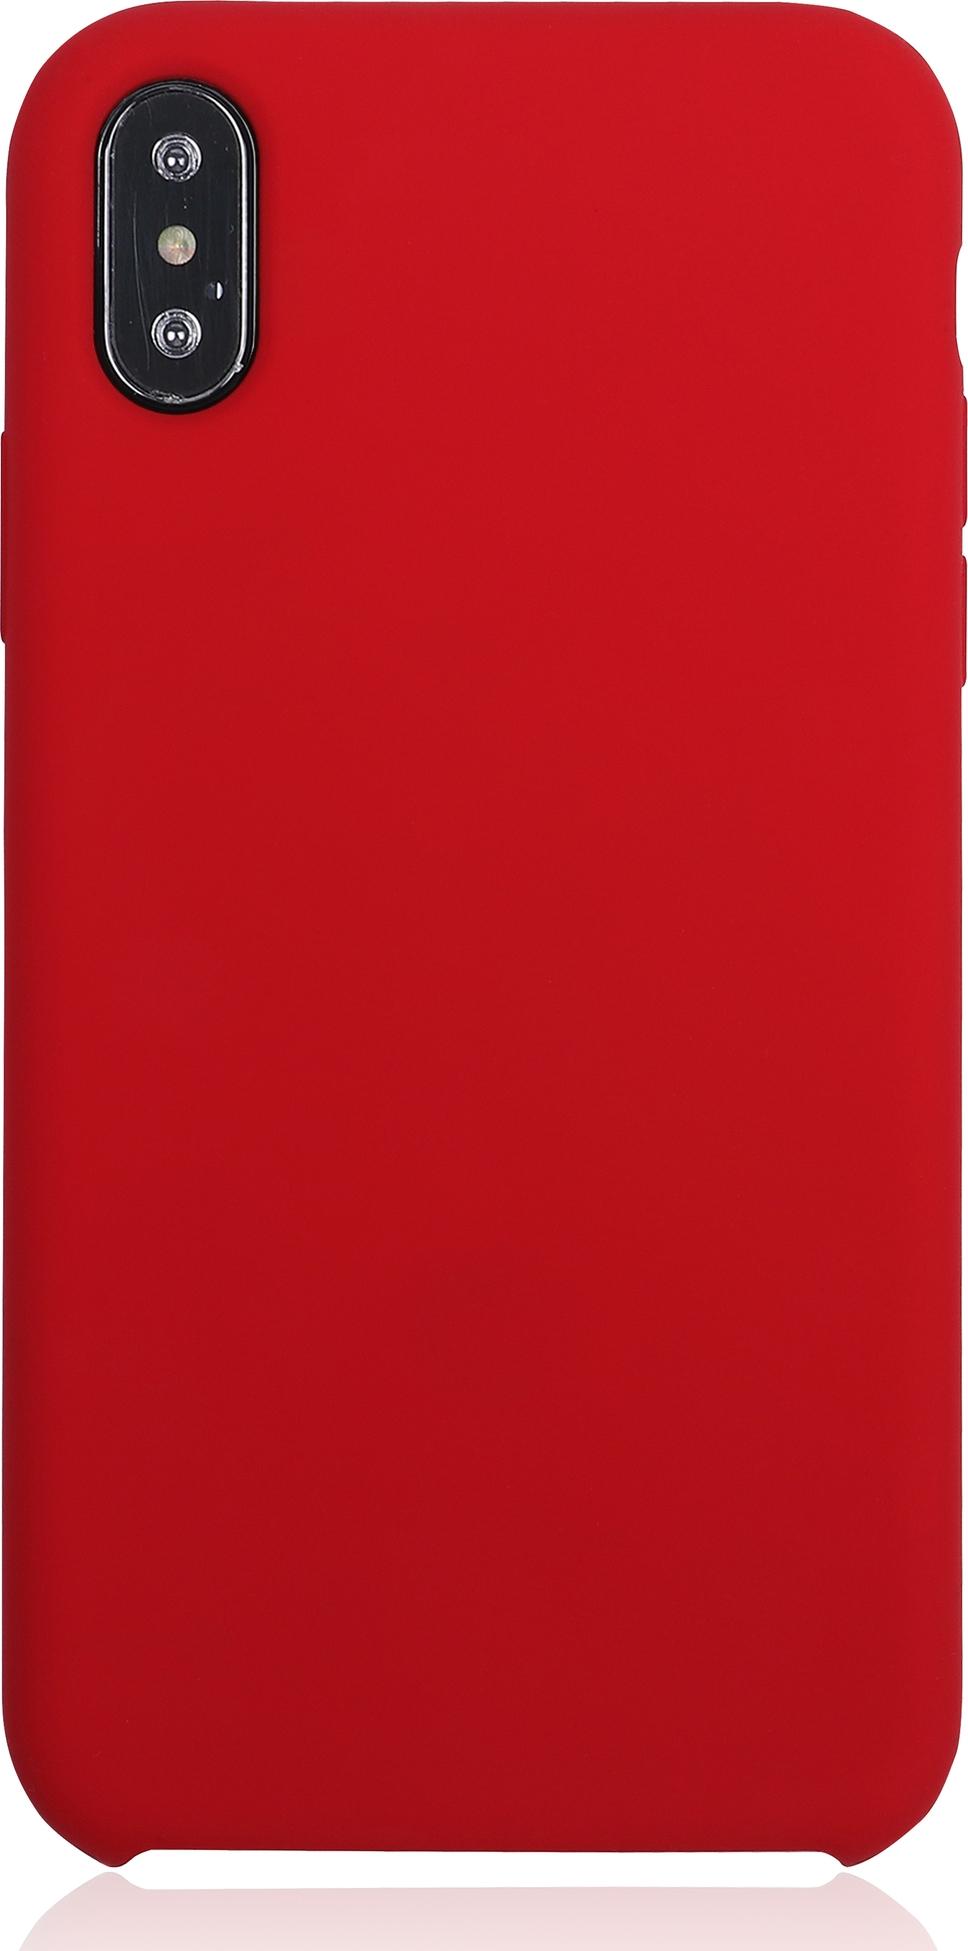 Чехол Brosco Softrubber для Apple iPhone XS Max, красный цена и фото